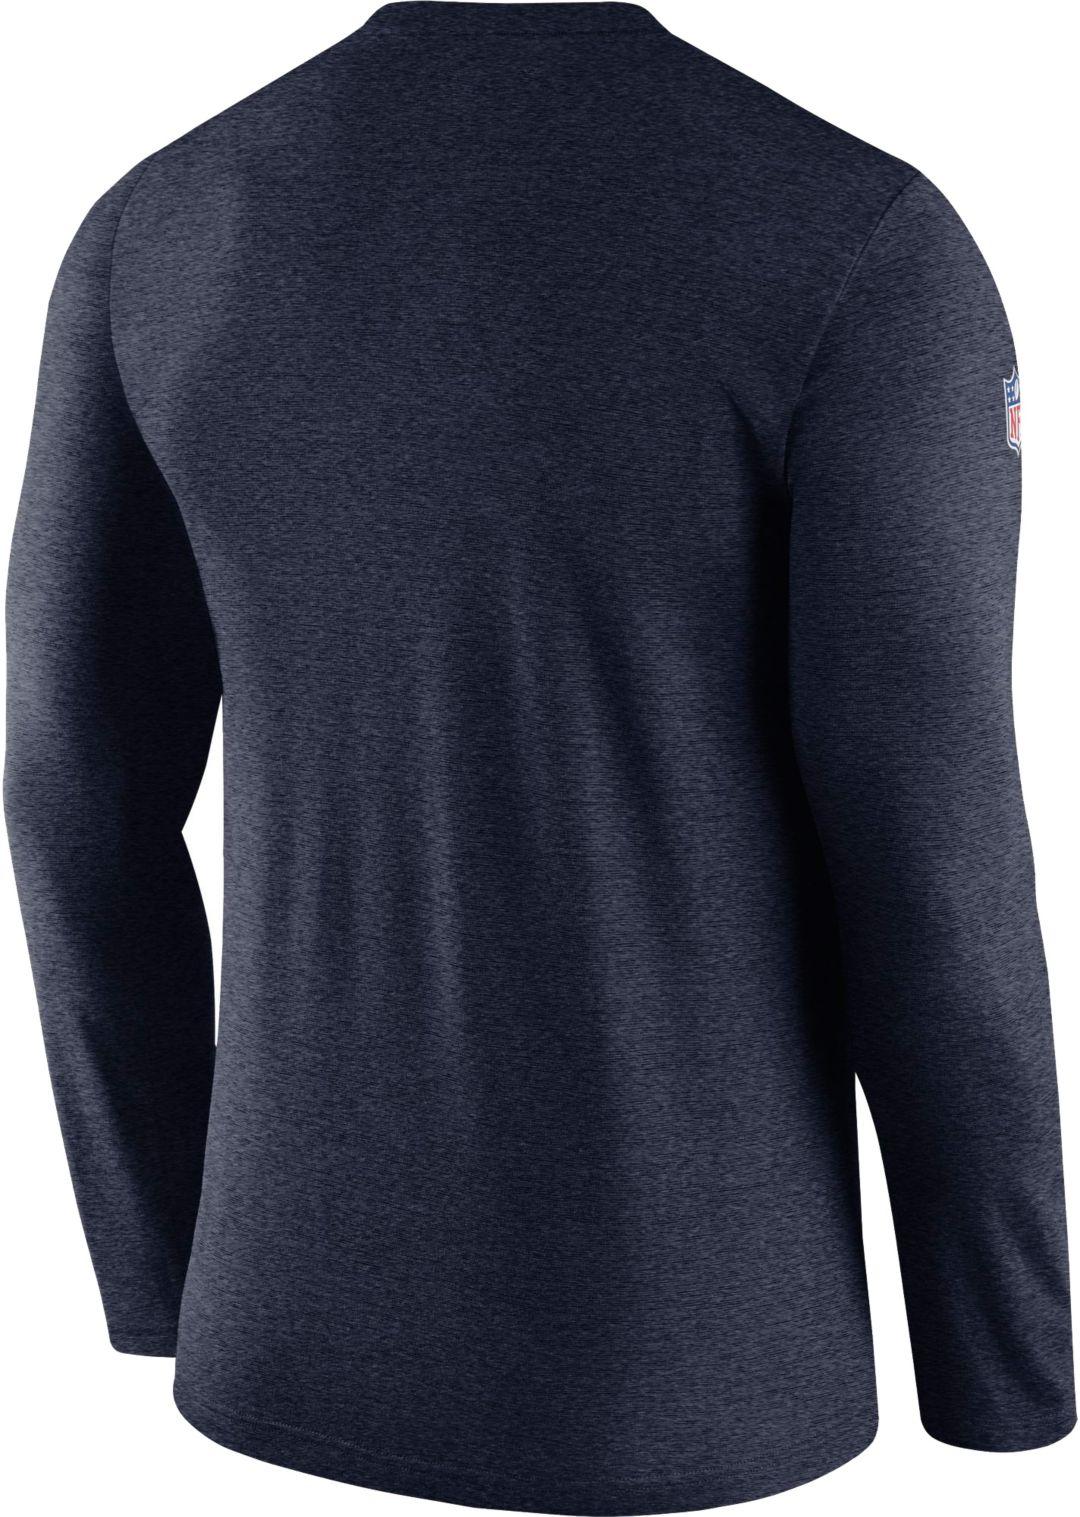 998d448d Nike Men's Dallas Cowboys Sideline Coach Performance Navy Long Sleeve Shirt